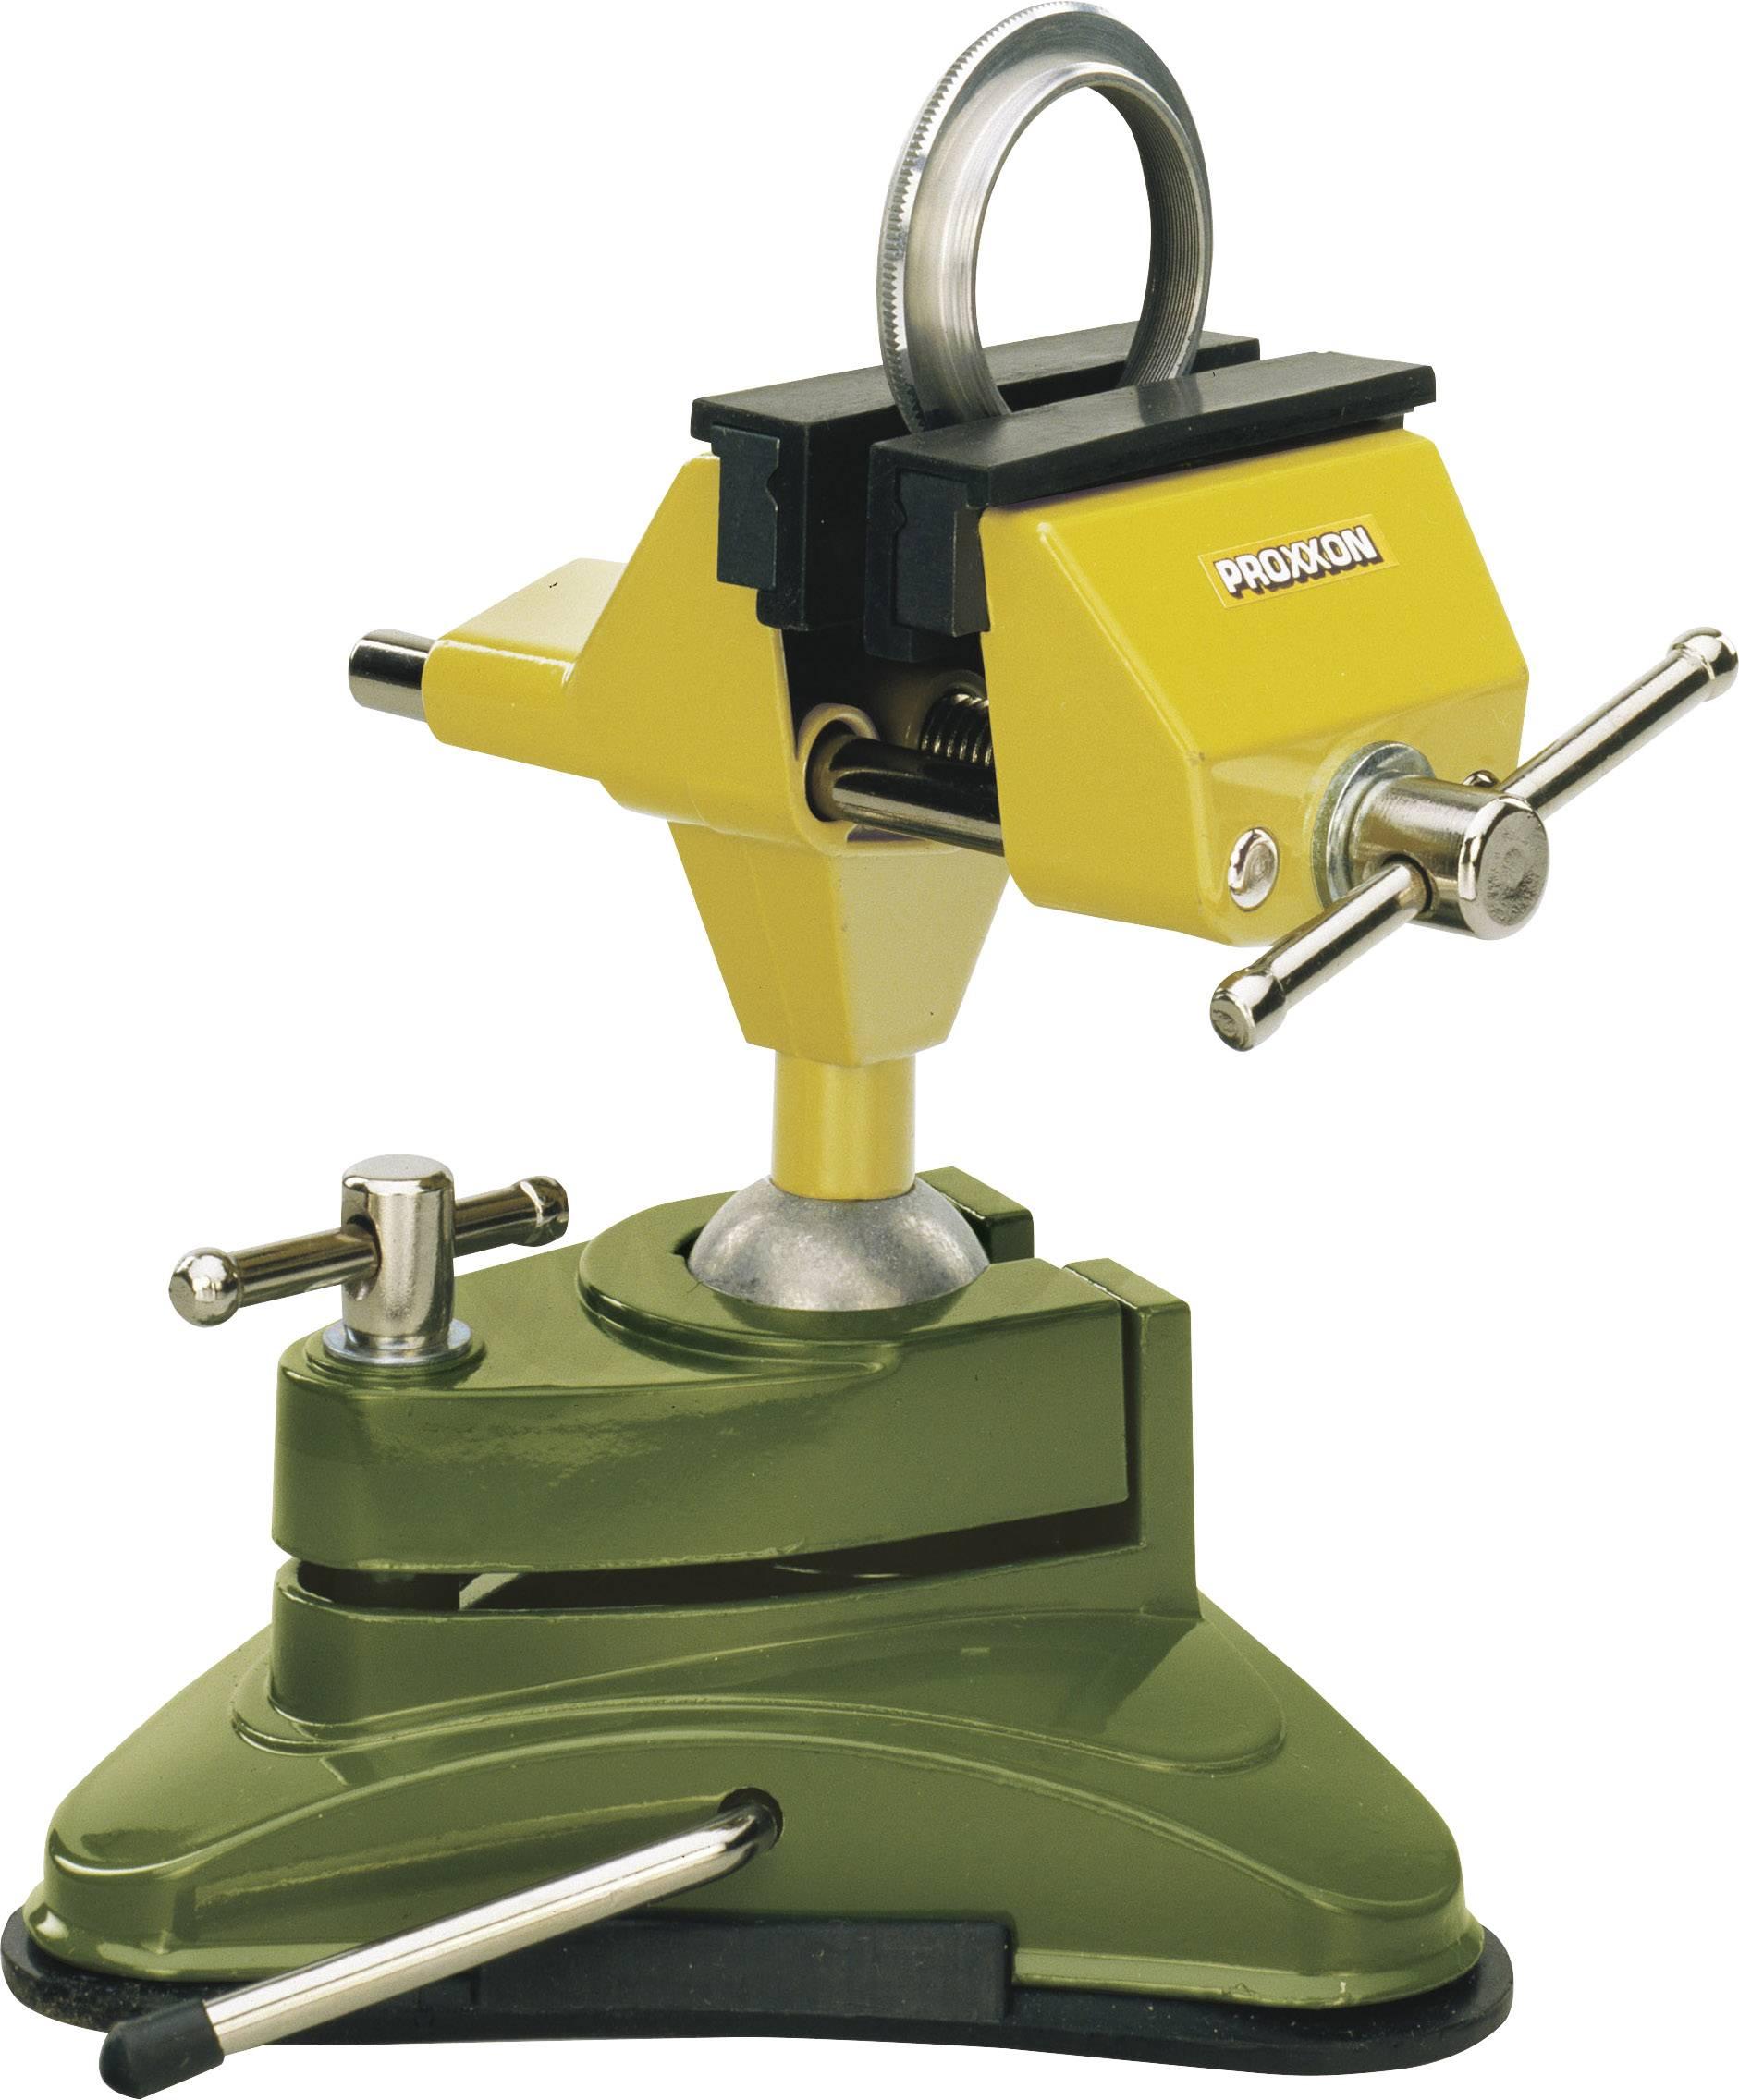 Zverák na jemnou mechaniku Proxxon Micromot FMS 75 28 602, Rozpätie (max.): 70 mm